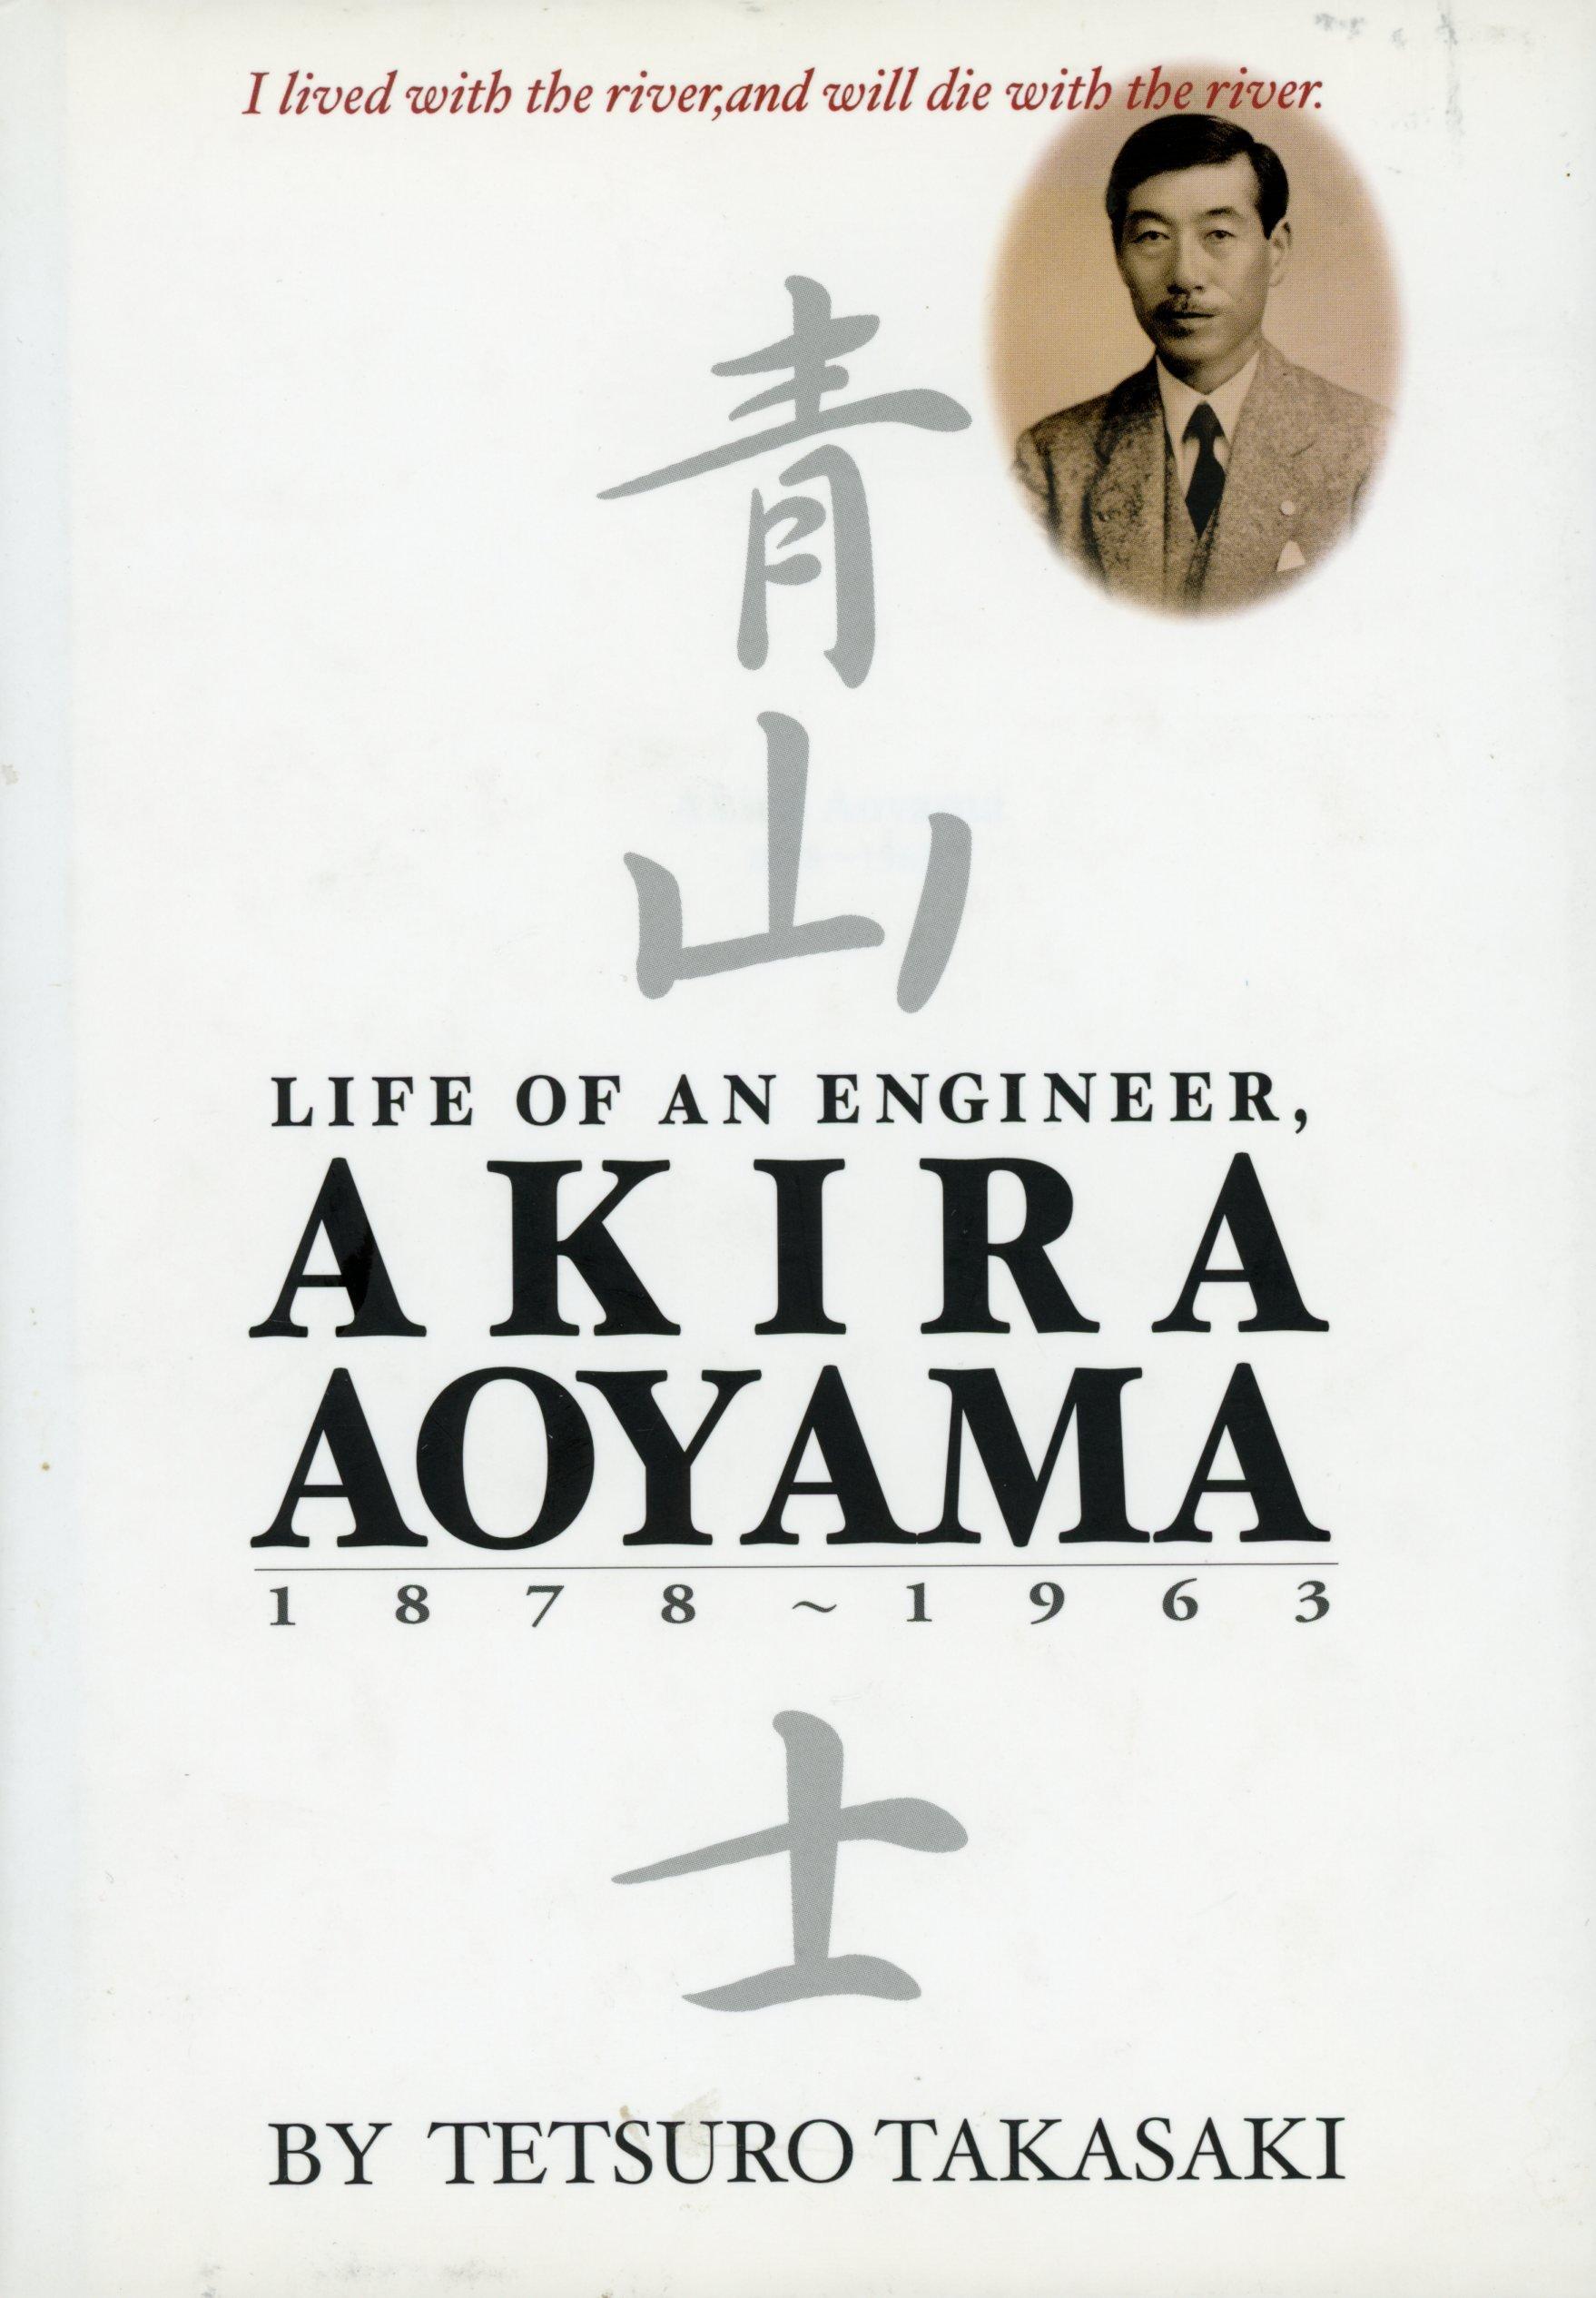 Life of An Engineer, Akira Aoyama 1878-1963, Tetsuro Takasaki.